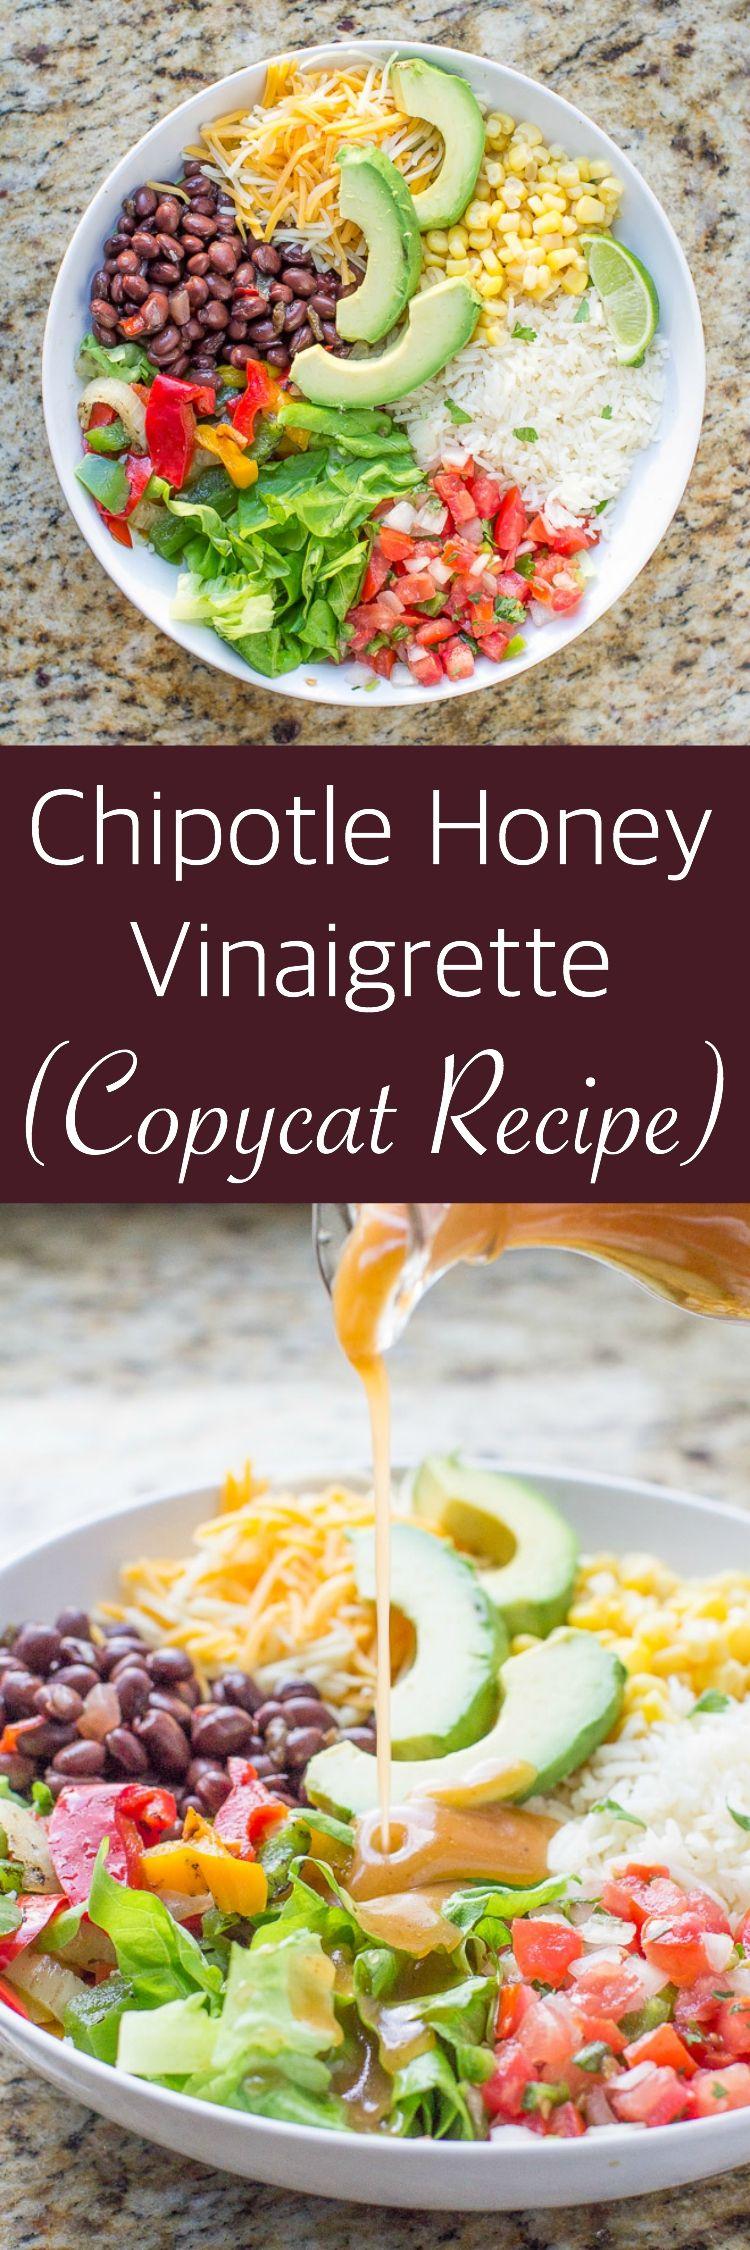 Chipotle honey vinaigrette recipe copycat recipe